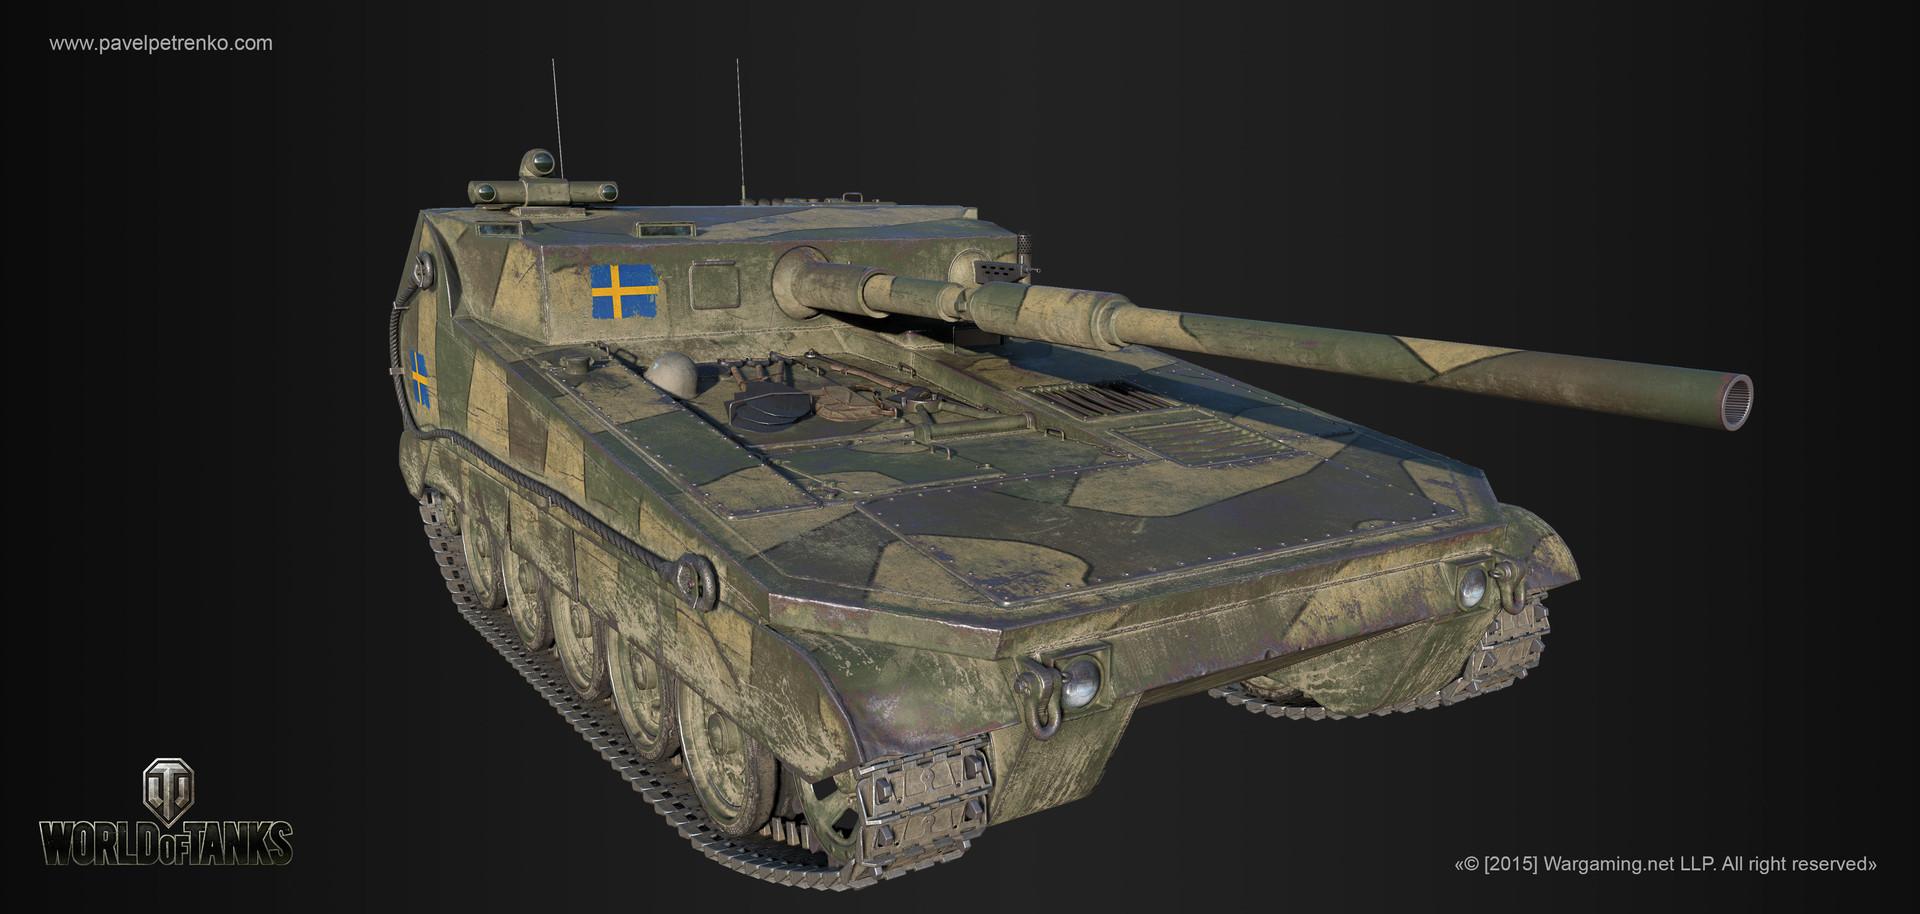 Pavel petrenko ikv 90 typ b 002